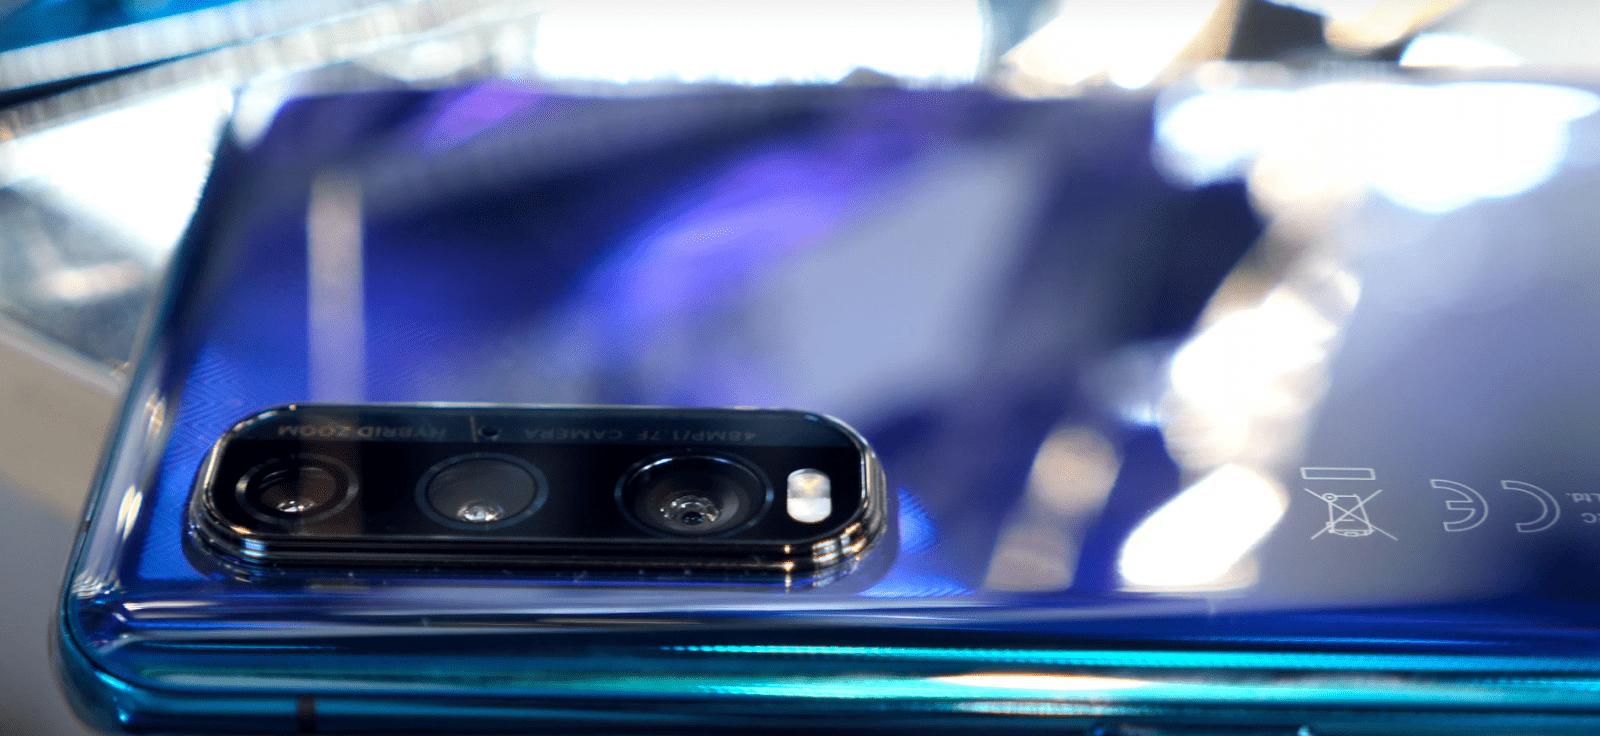 Oppo представил новый смартфон Find X2